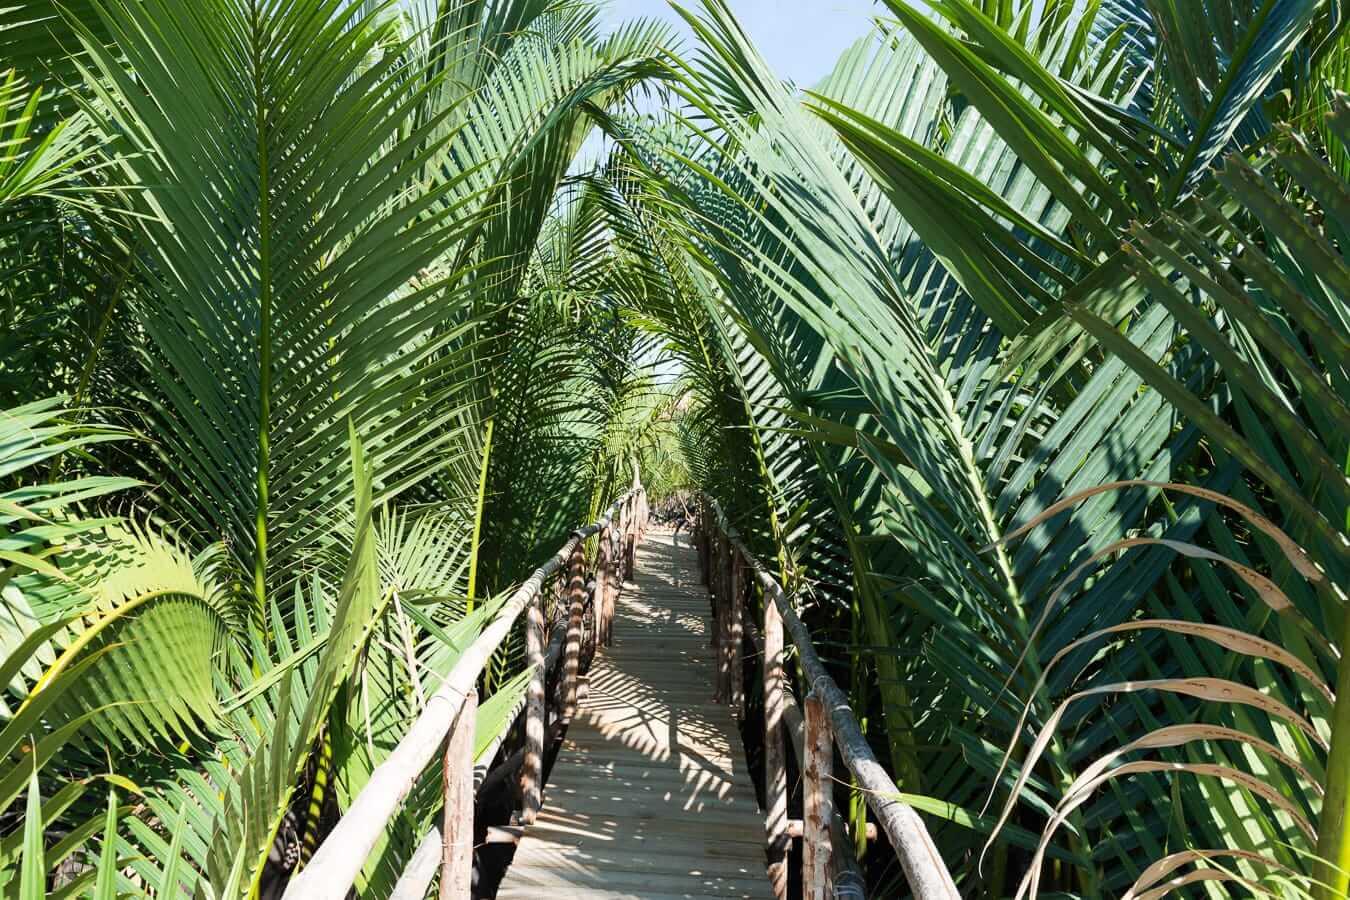 Bamboo walkways